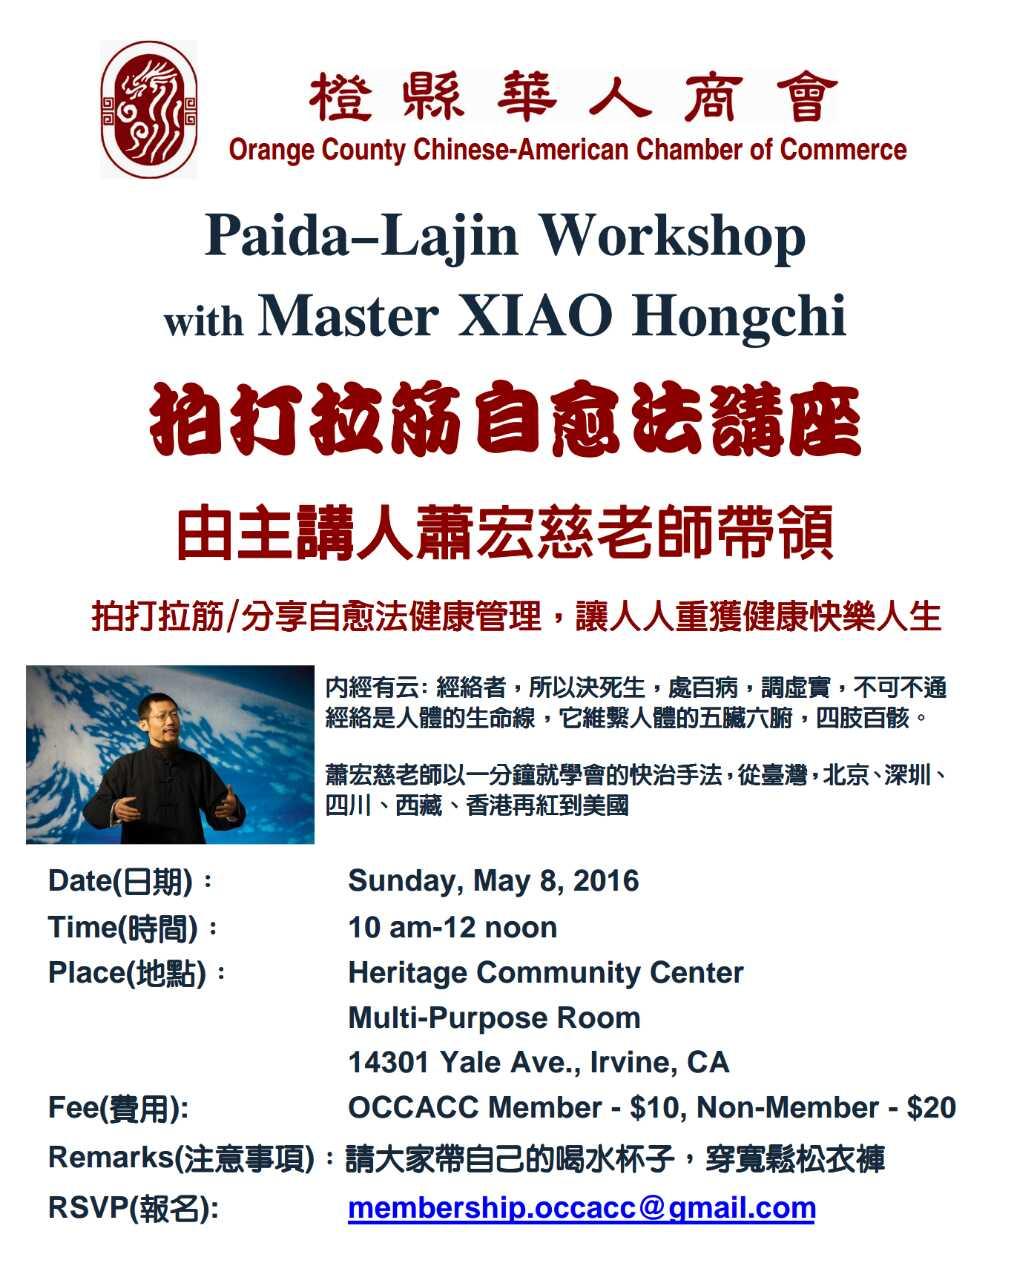 OCCACC PaidaLajin Workshop in Irvine, CA (May 8,2016)